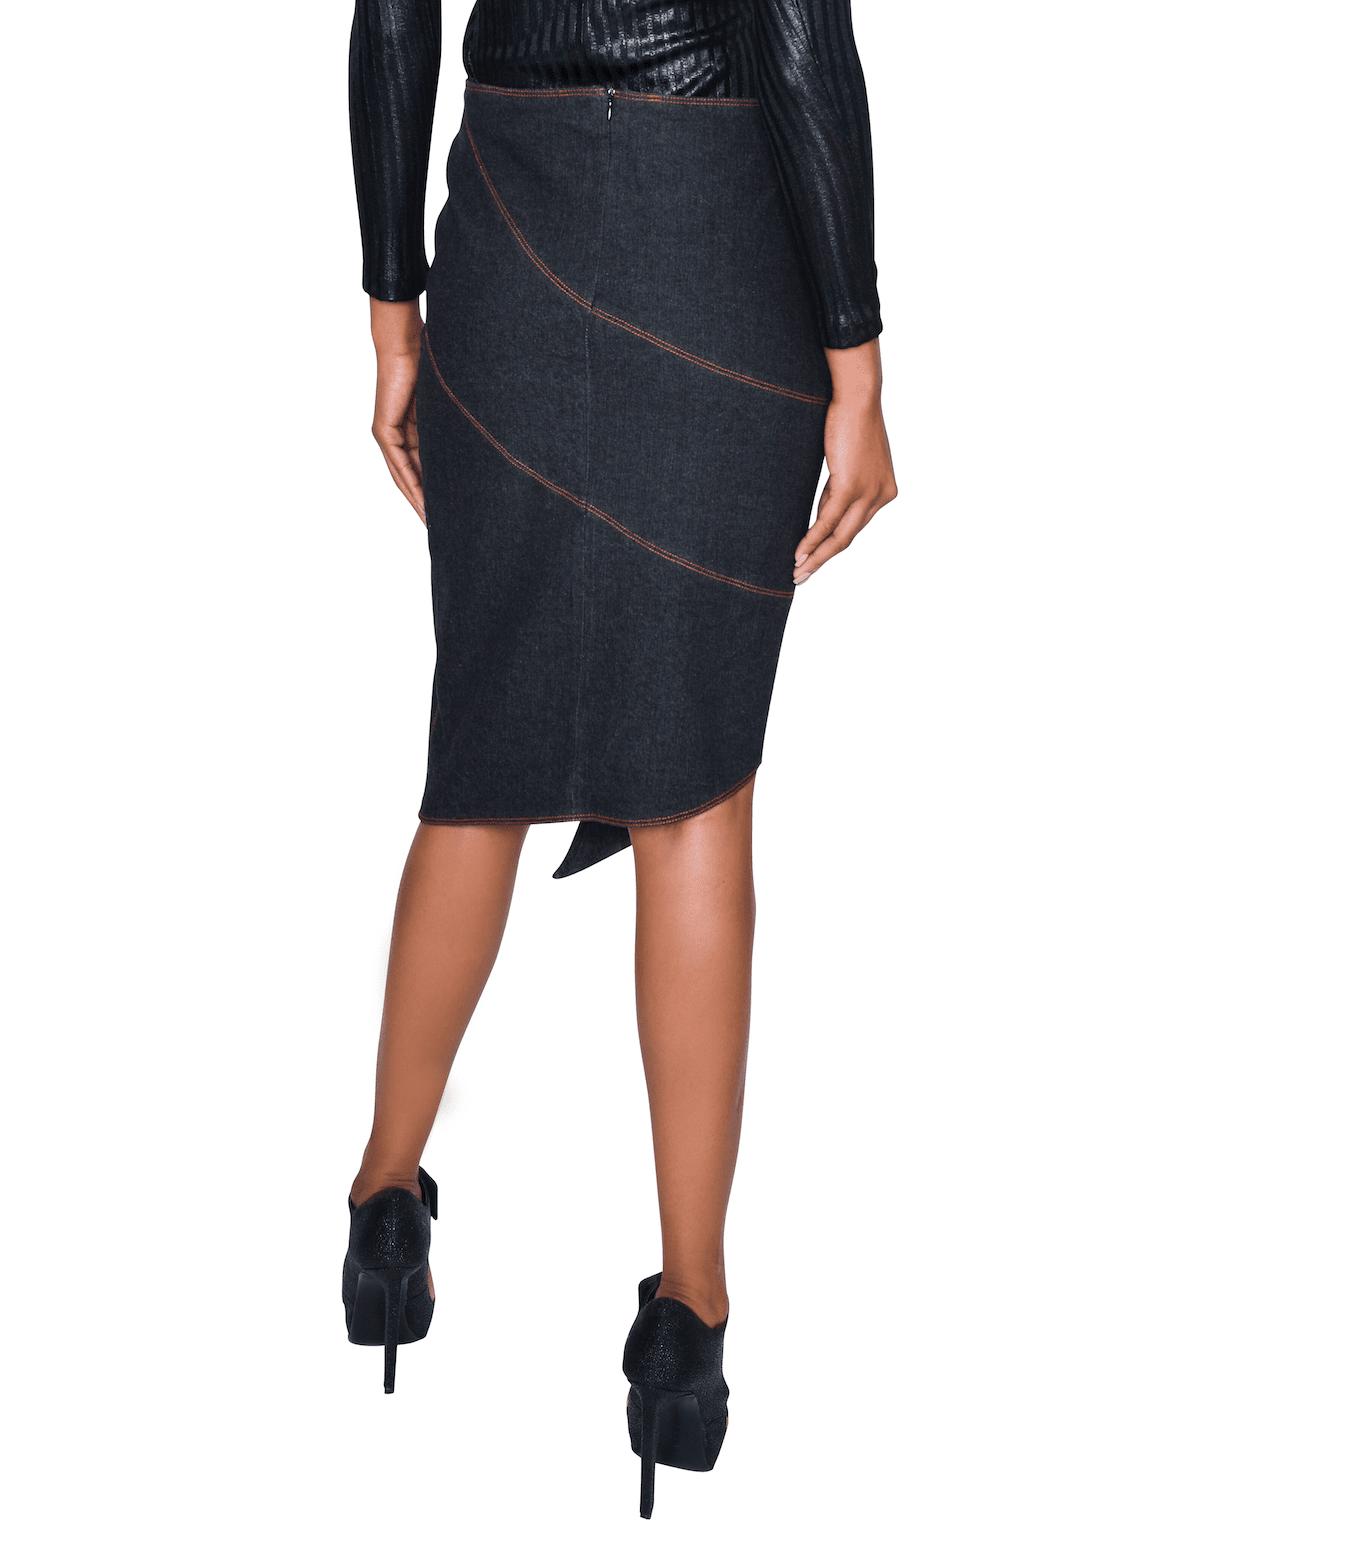 Skirt ALFIRK 3